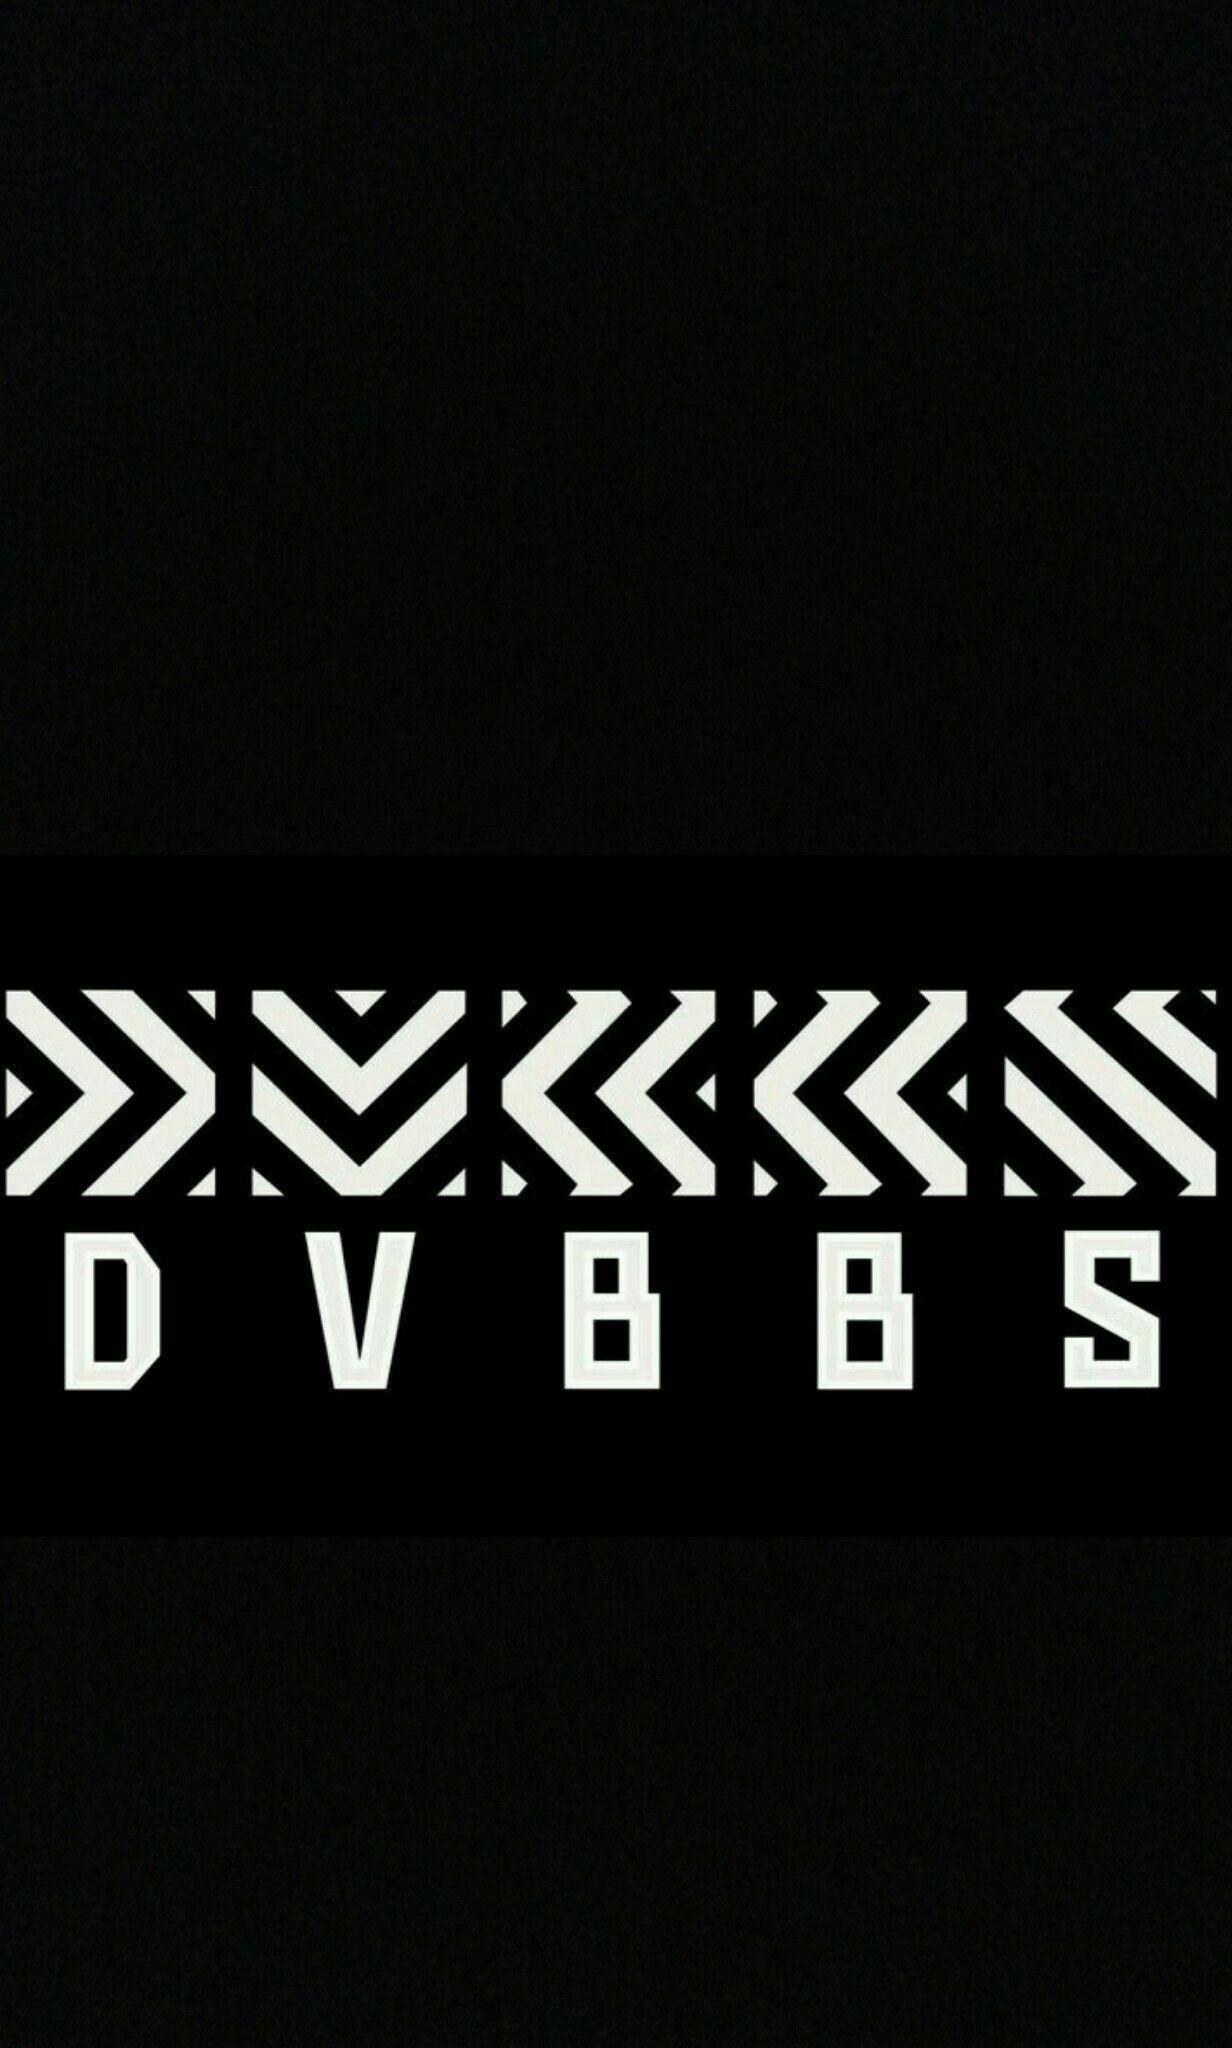 Dvbbs Wallpapers And Top Mix Logo De Dj Musica Electronica Electronica